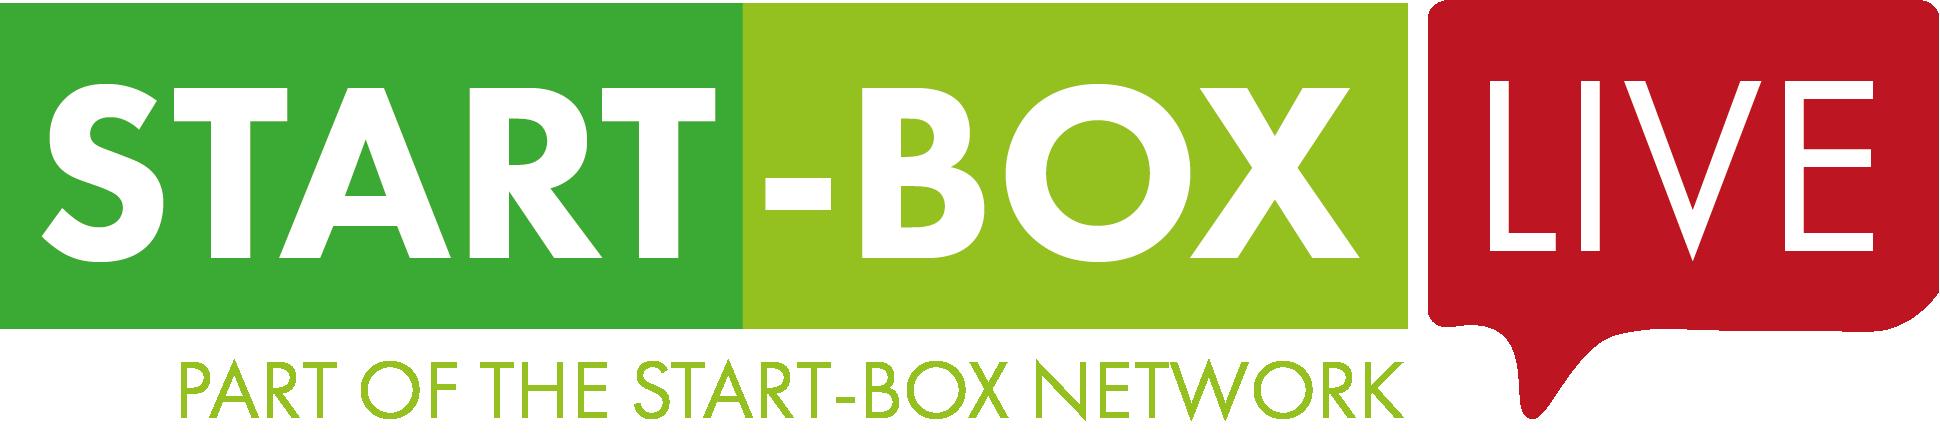 Start-box